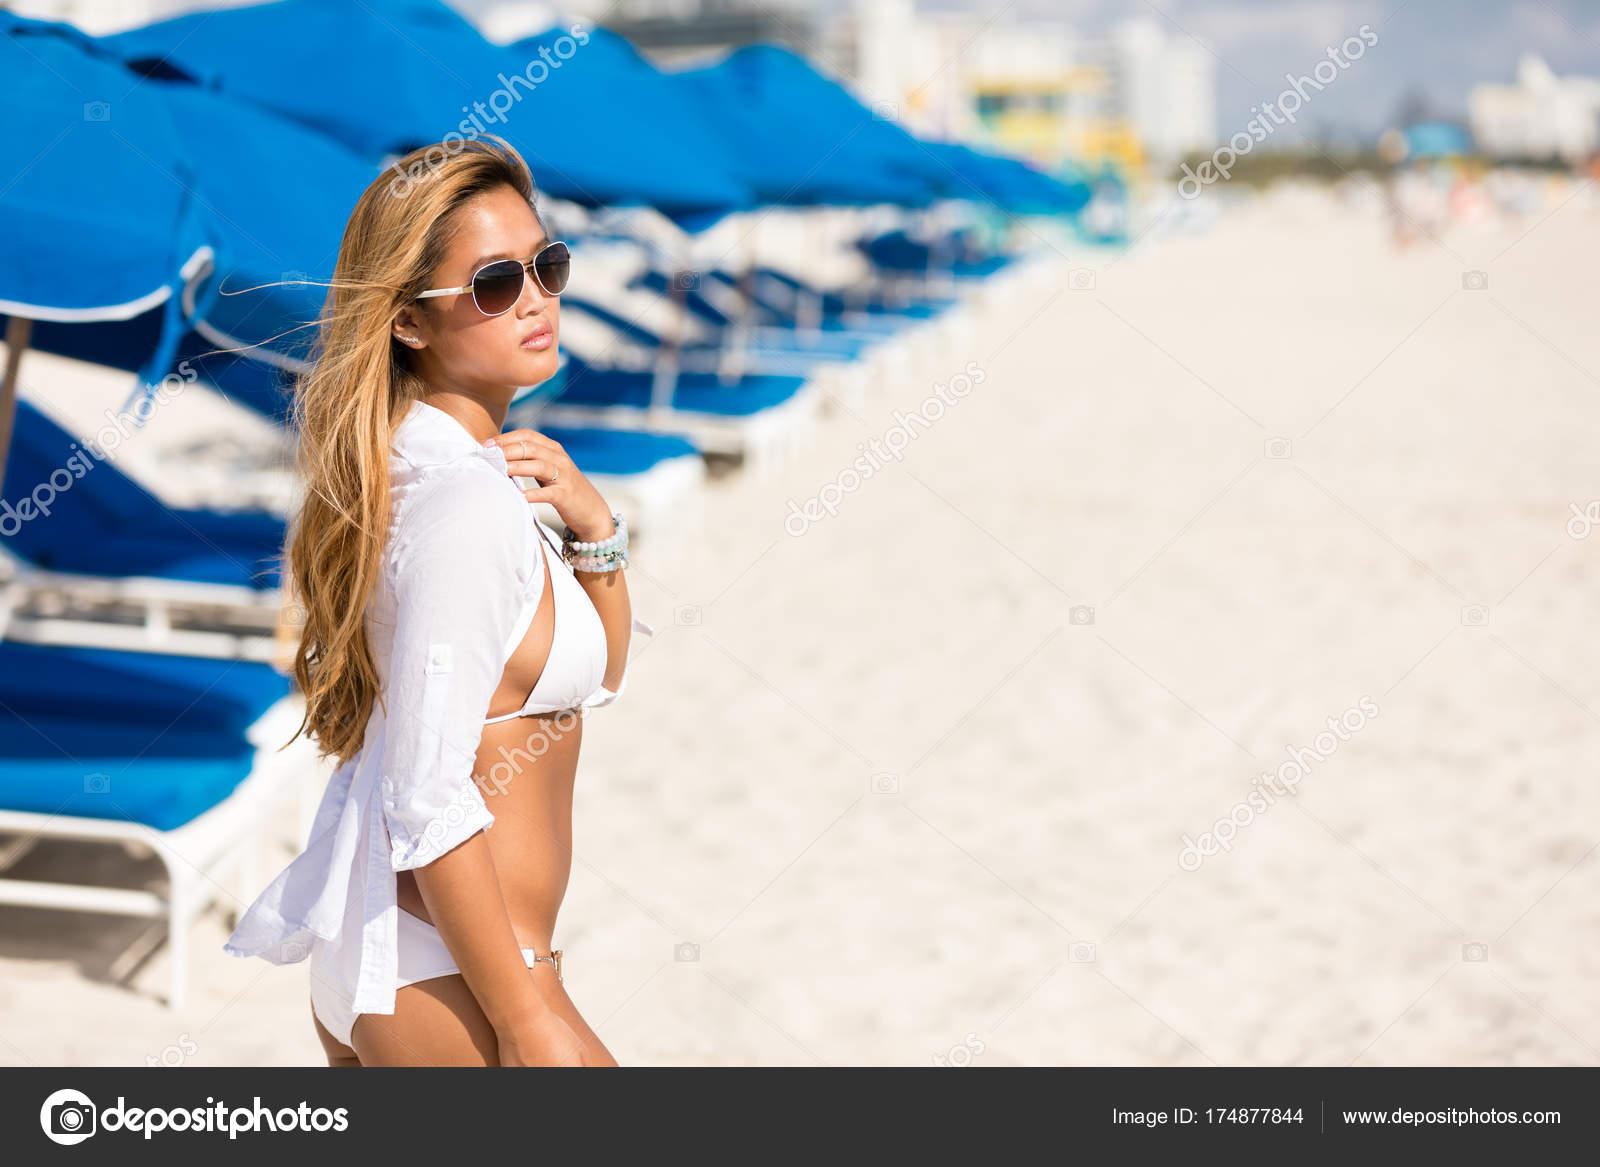 2c6a03c1878 Όμορφη γυναίκα της Ασίας σέξι μπικίνι πάνω φόντο παραλία θέρετρο ...